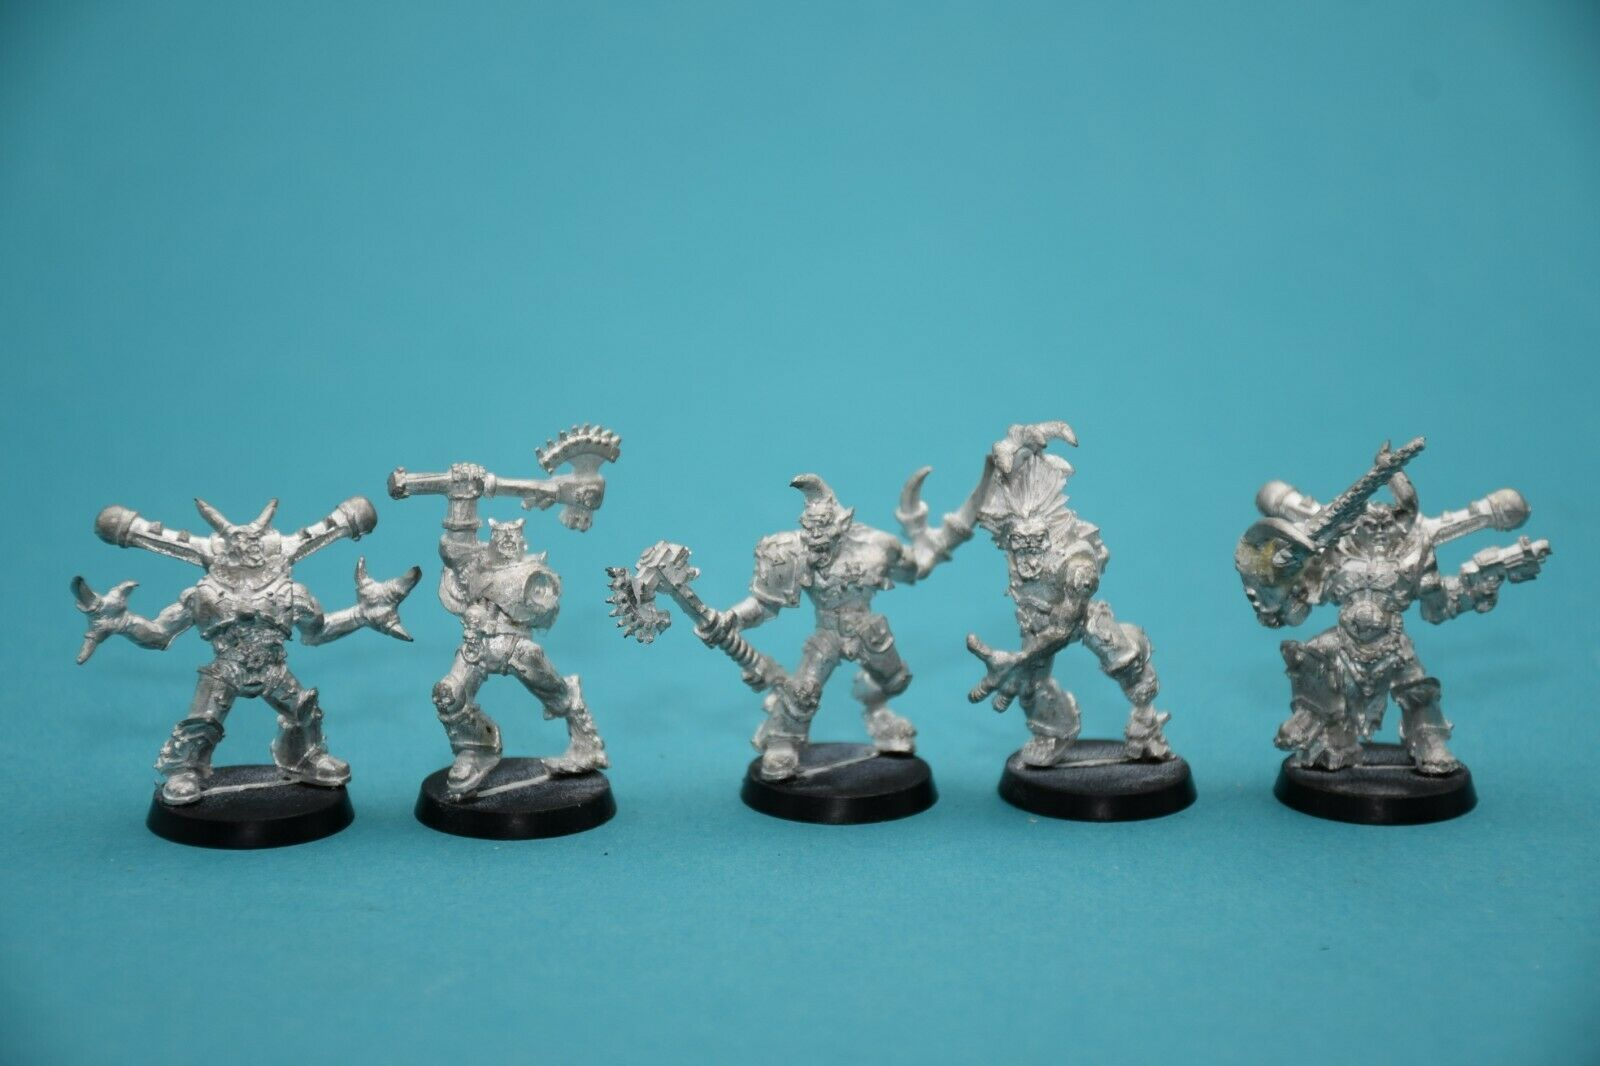 Warhammer  40k Chaos spazio Marine Possessed (5) MetalOOPRare Lot2  risposte rapide